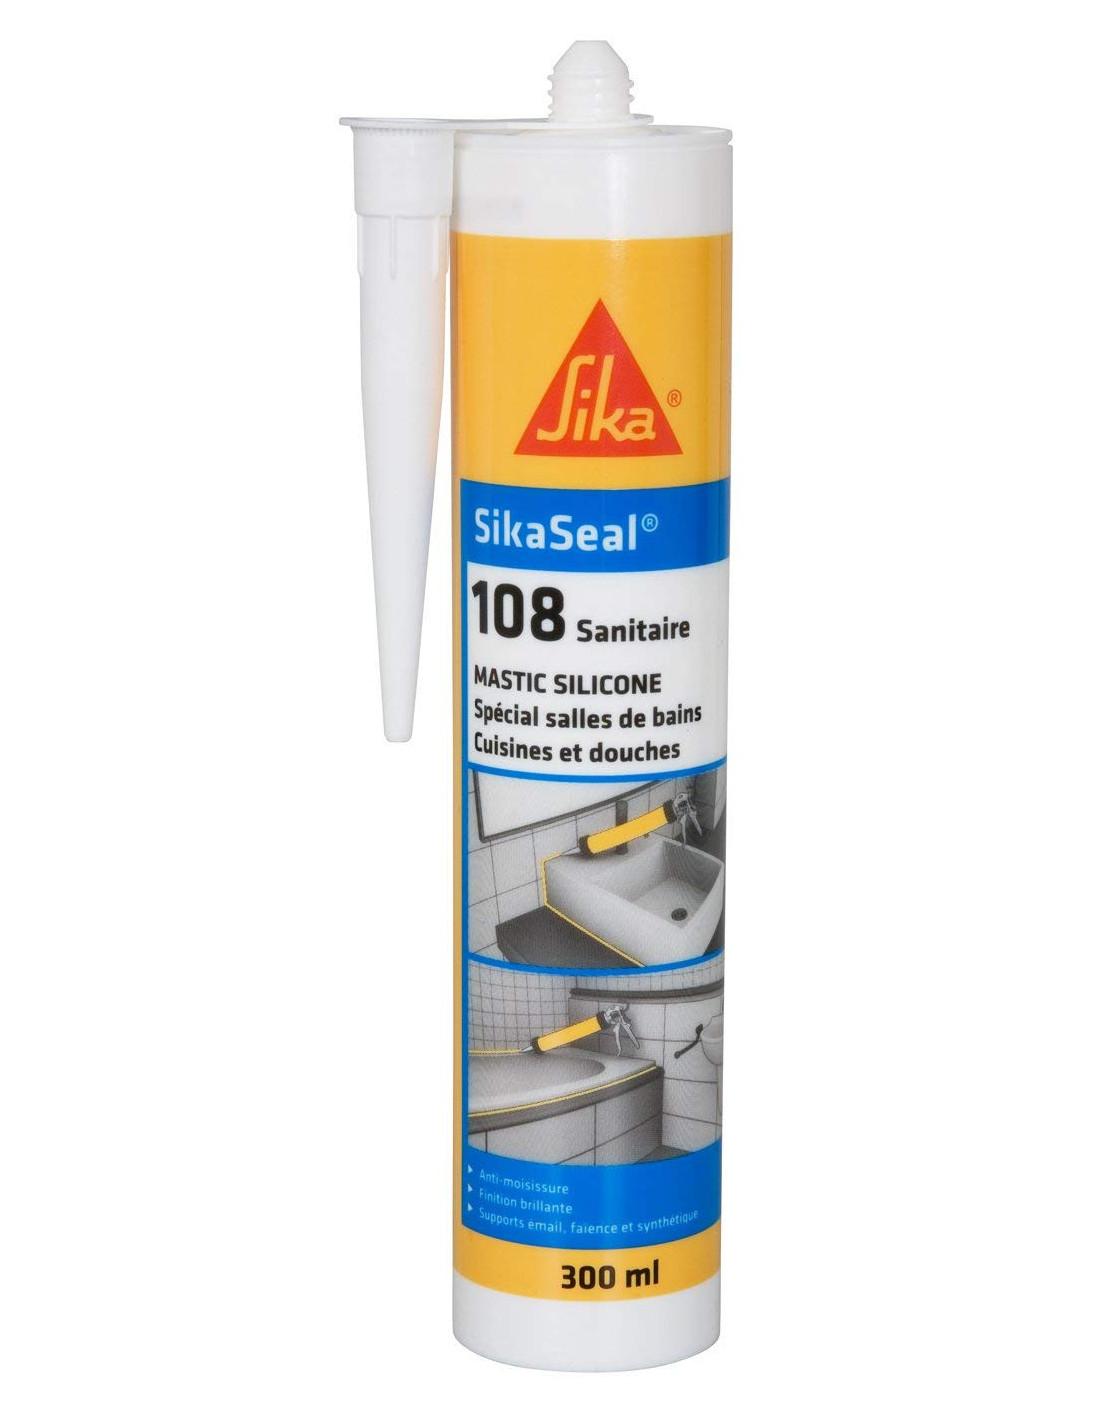 Sika Sikaseal 108 Sanitaire Mastic Silicone Anti Moisissure